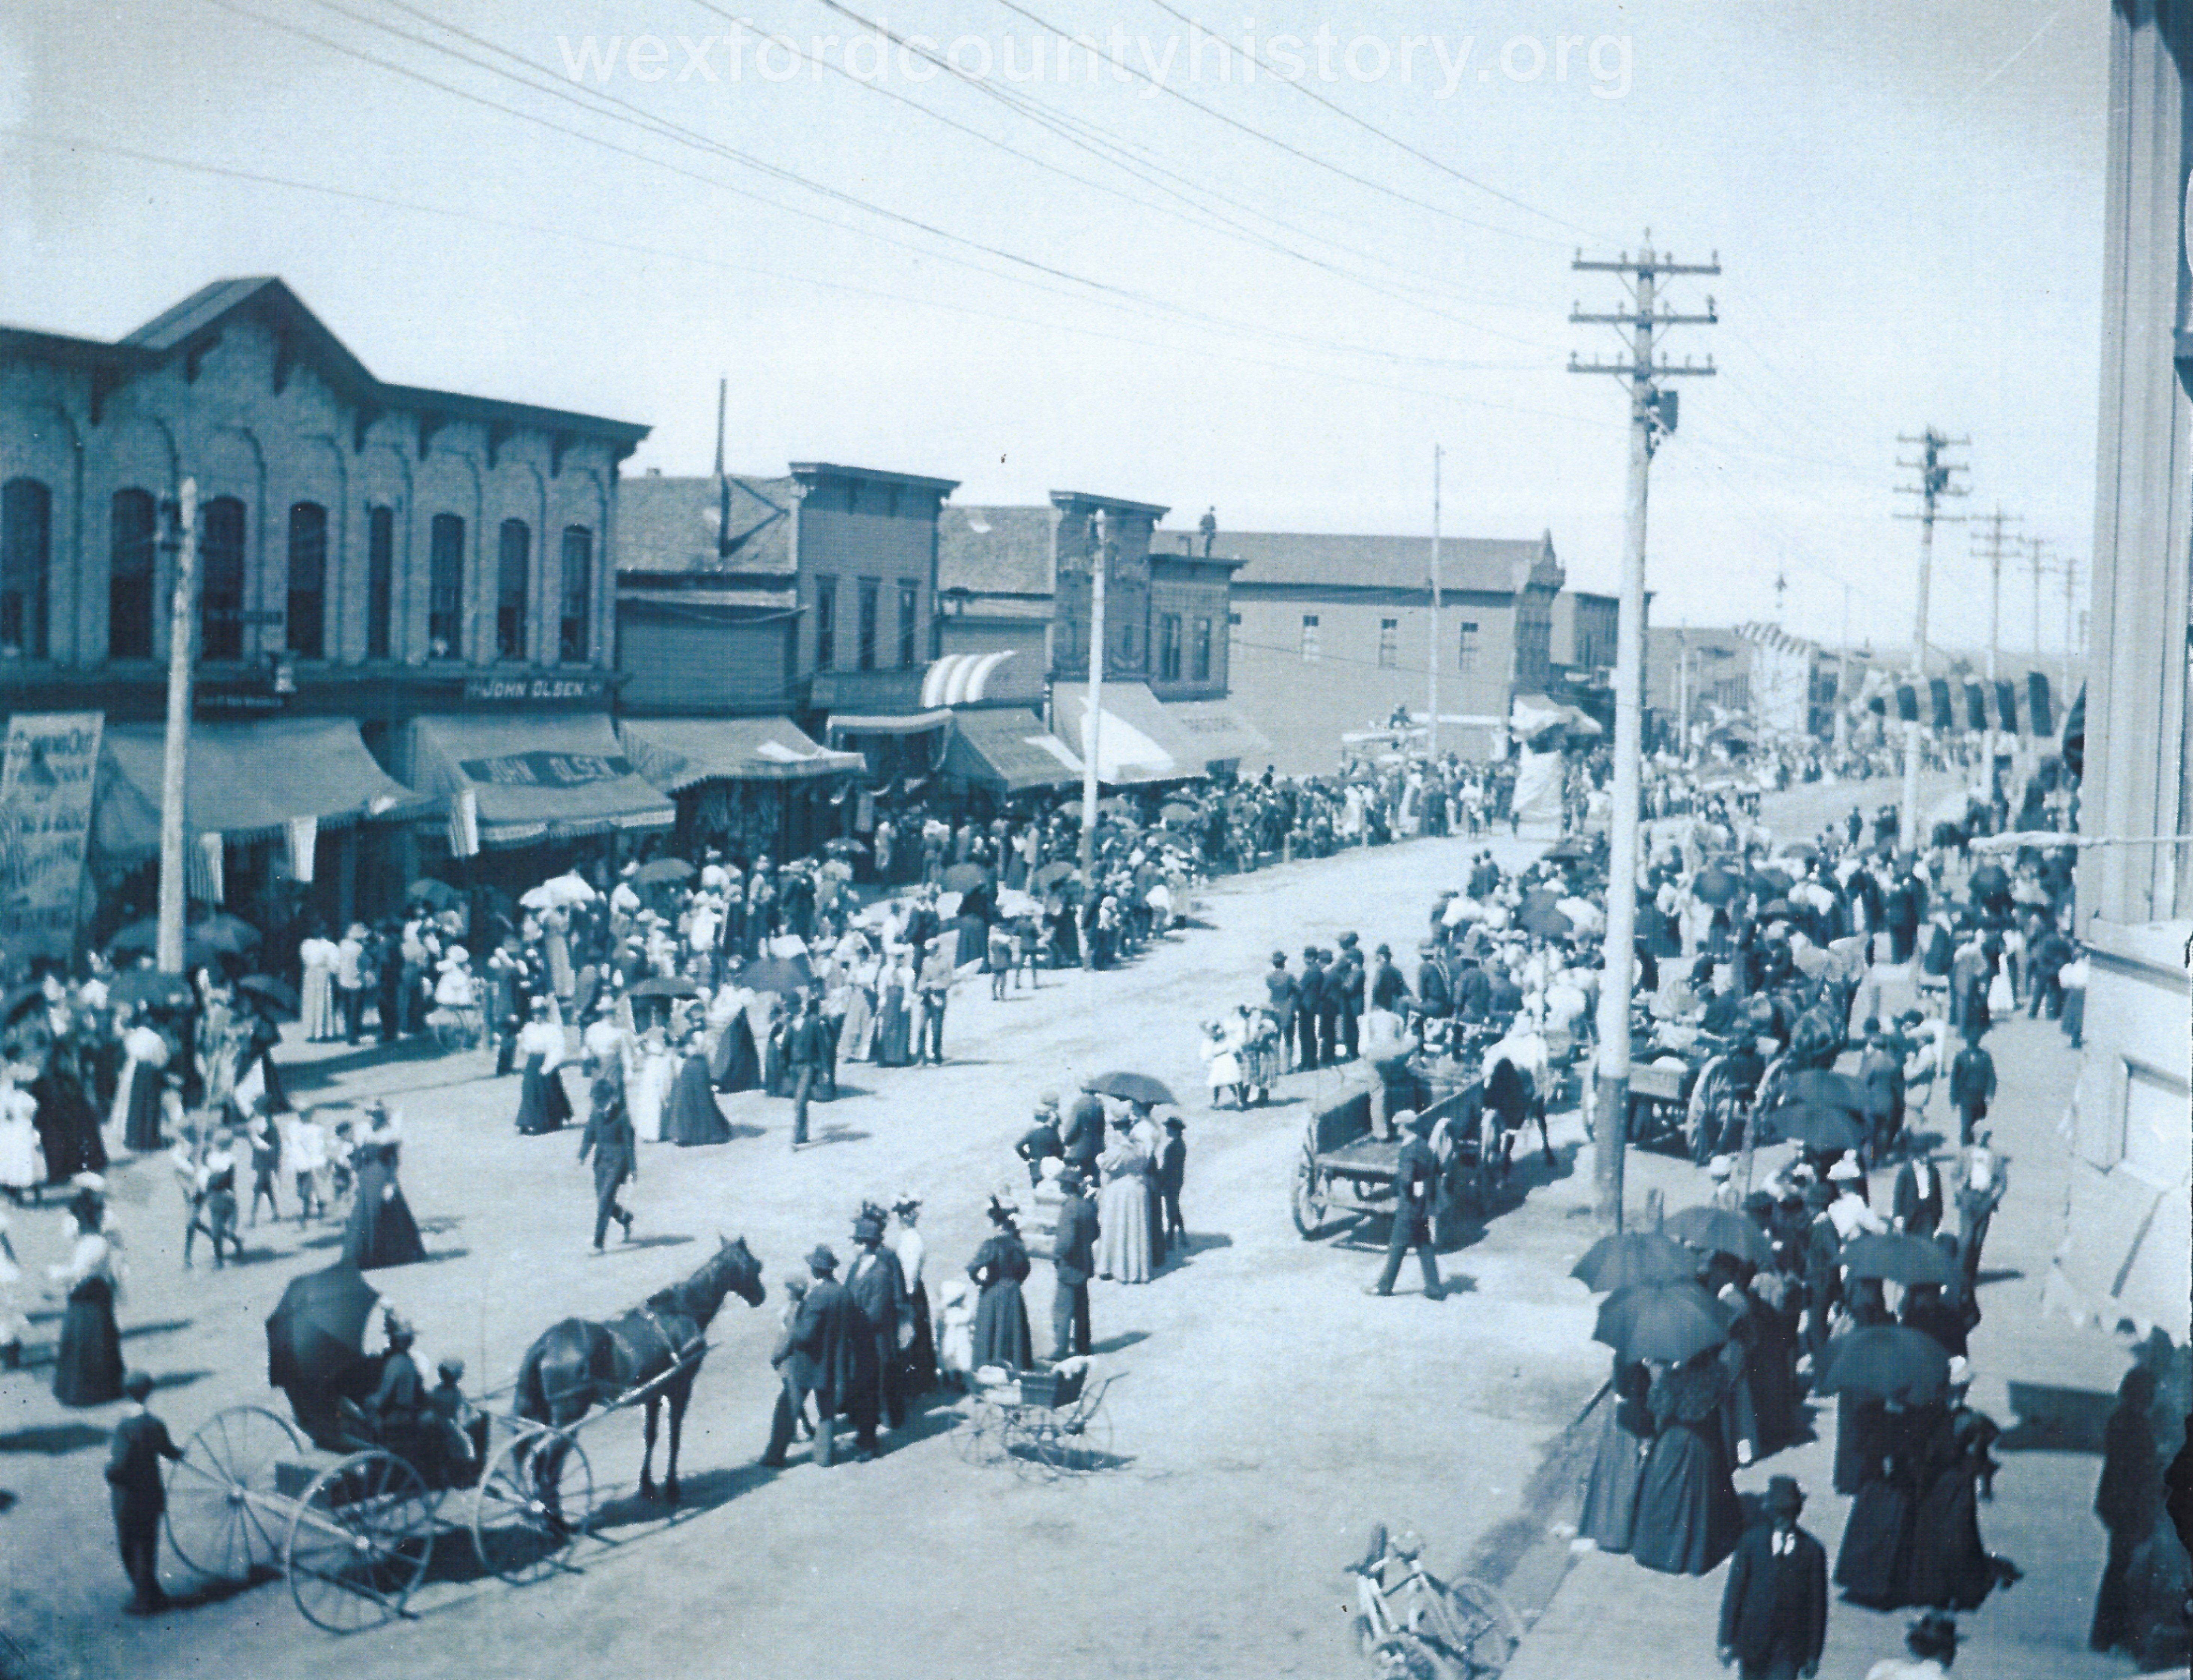 Cadillac-Parade-Late-1800s-Parade-2